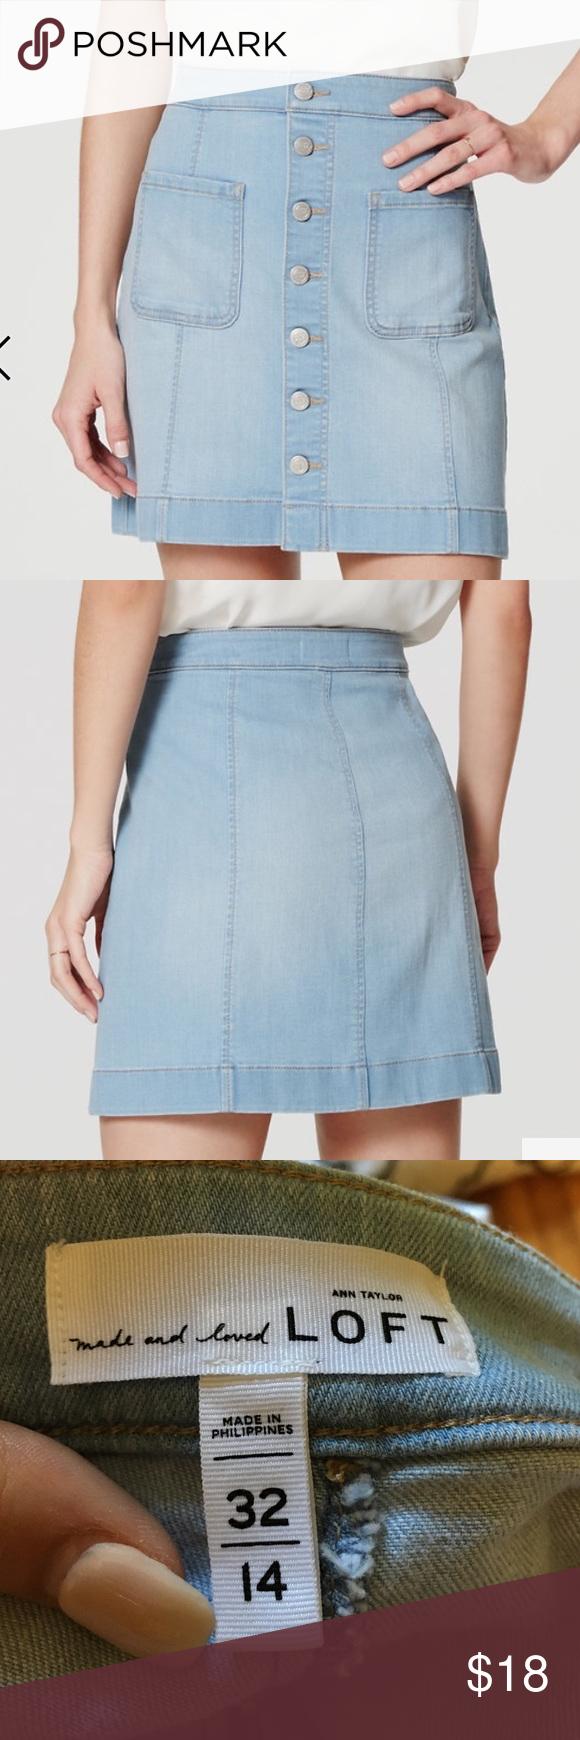 LOFT Patch Pocket Button Down Denim Skirt